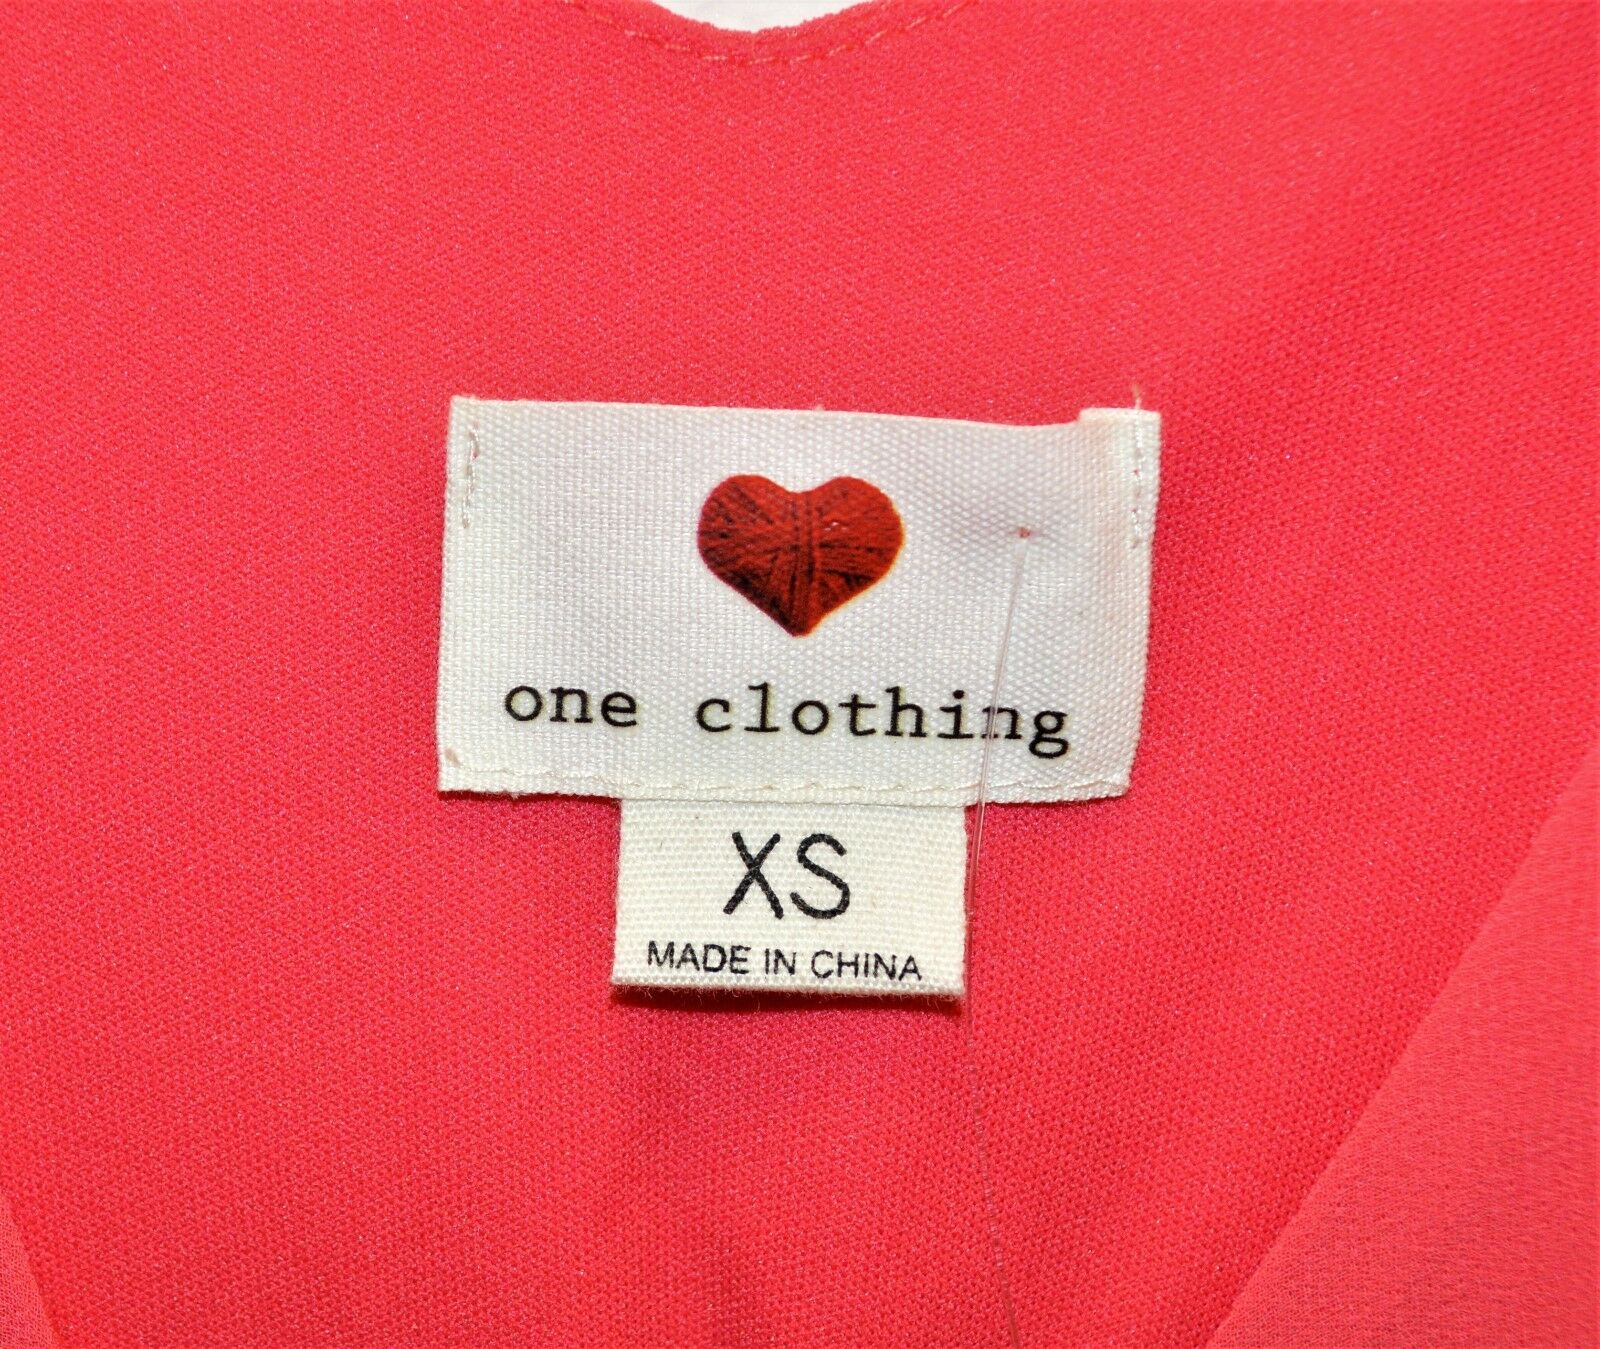 One Clothing Sleeveless Scarf Dress Dress Dress – Size XS NWT 669112